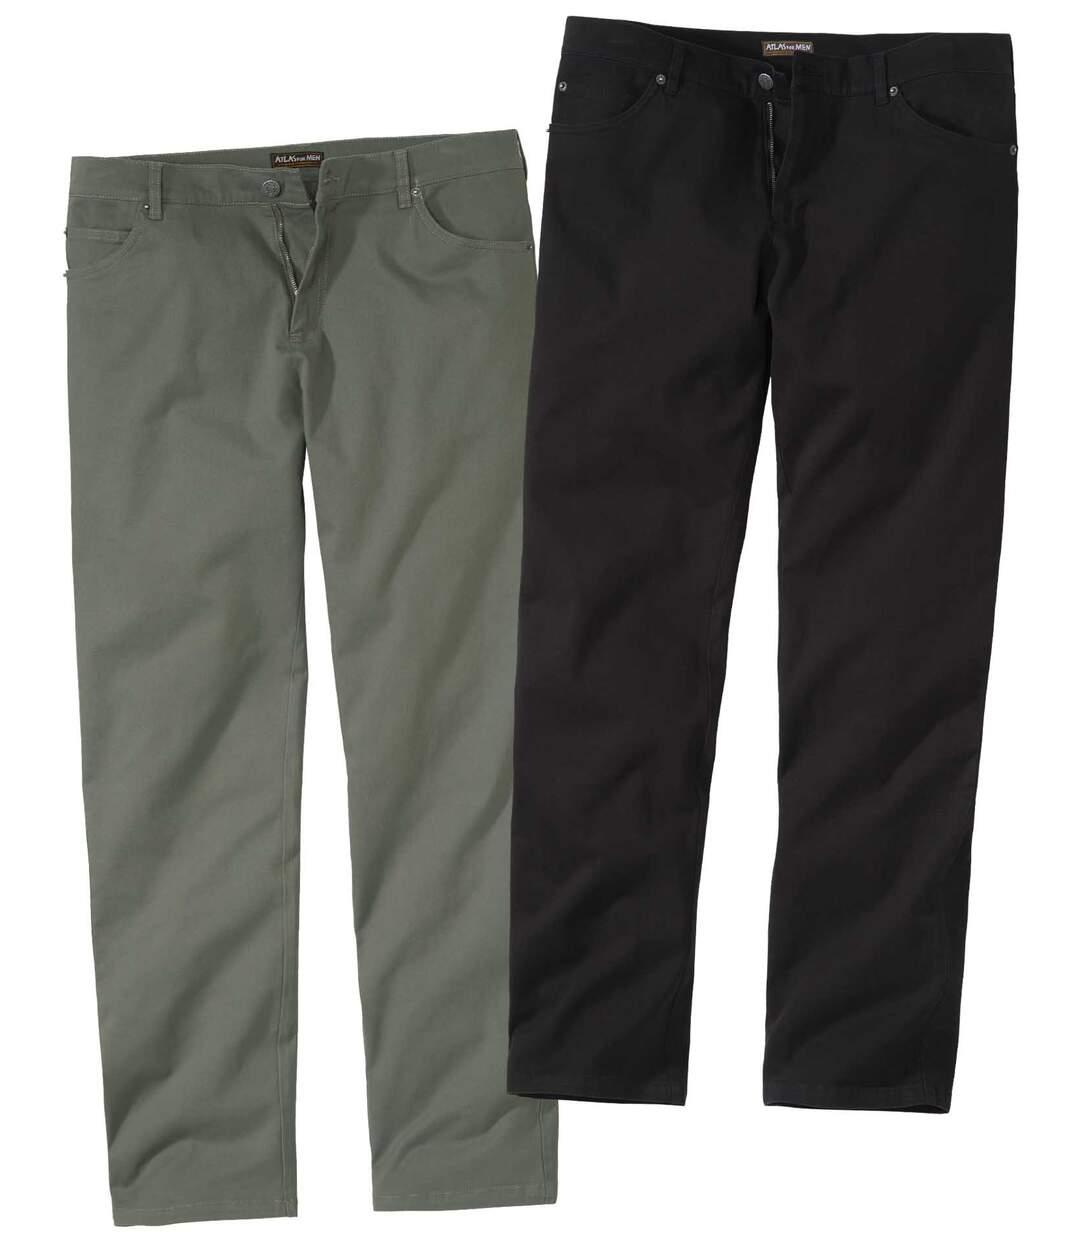 Pack of 2 Men's Twill Trousers - Khaki Black